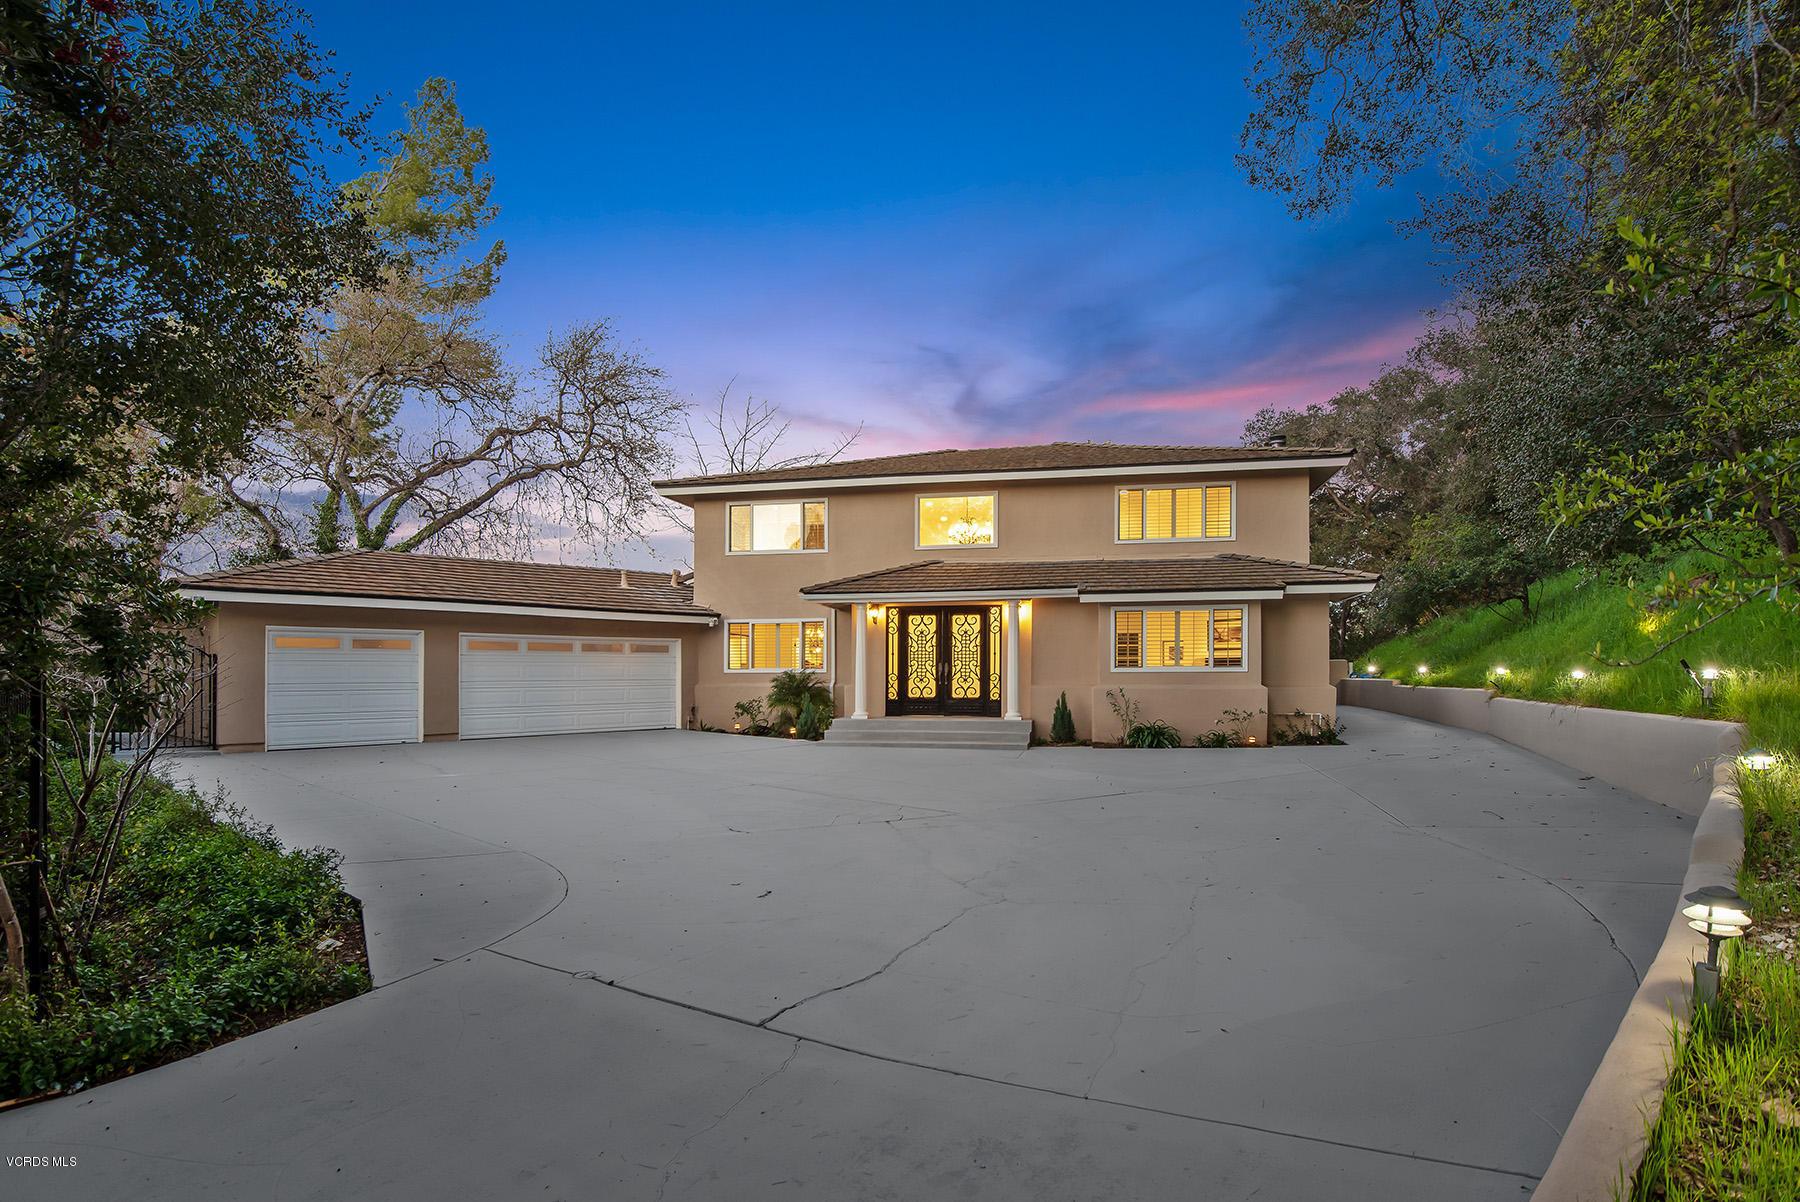 3658 Twin Lake Ridge, Westlake Village, Ca 91361 - Active Listing4 Bed | 4 BathSingle Family Home